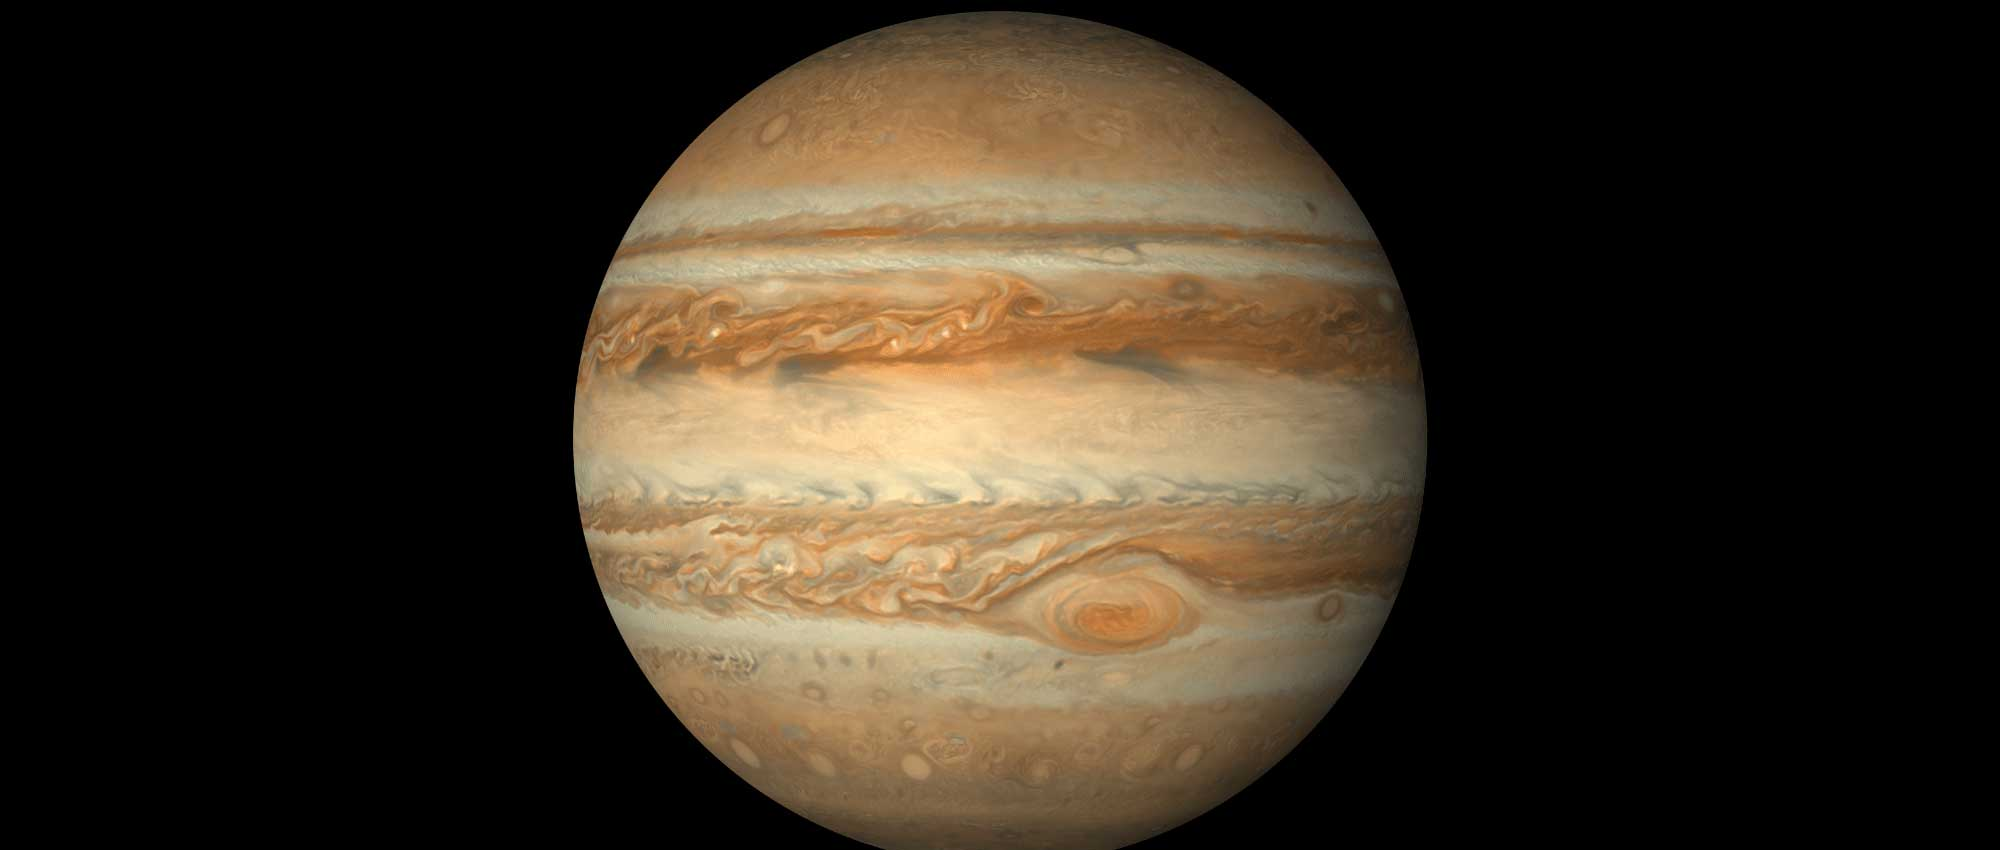 The plant Jupiter on a dark background